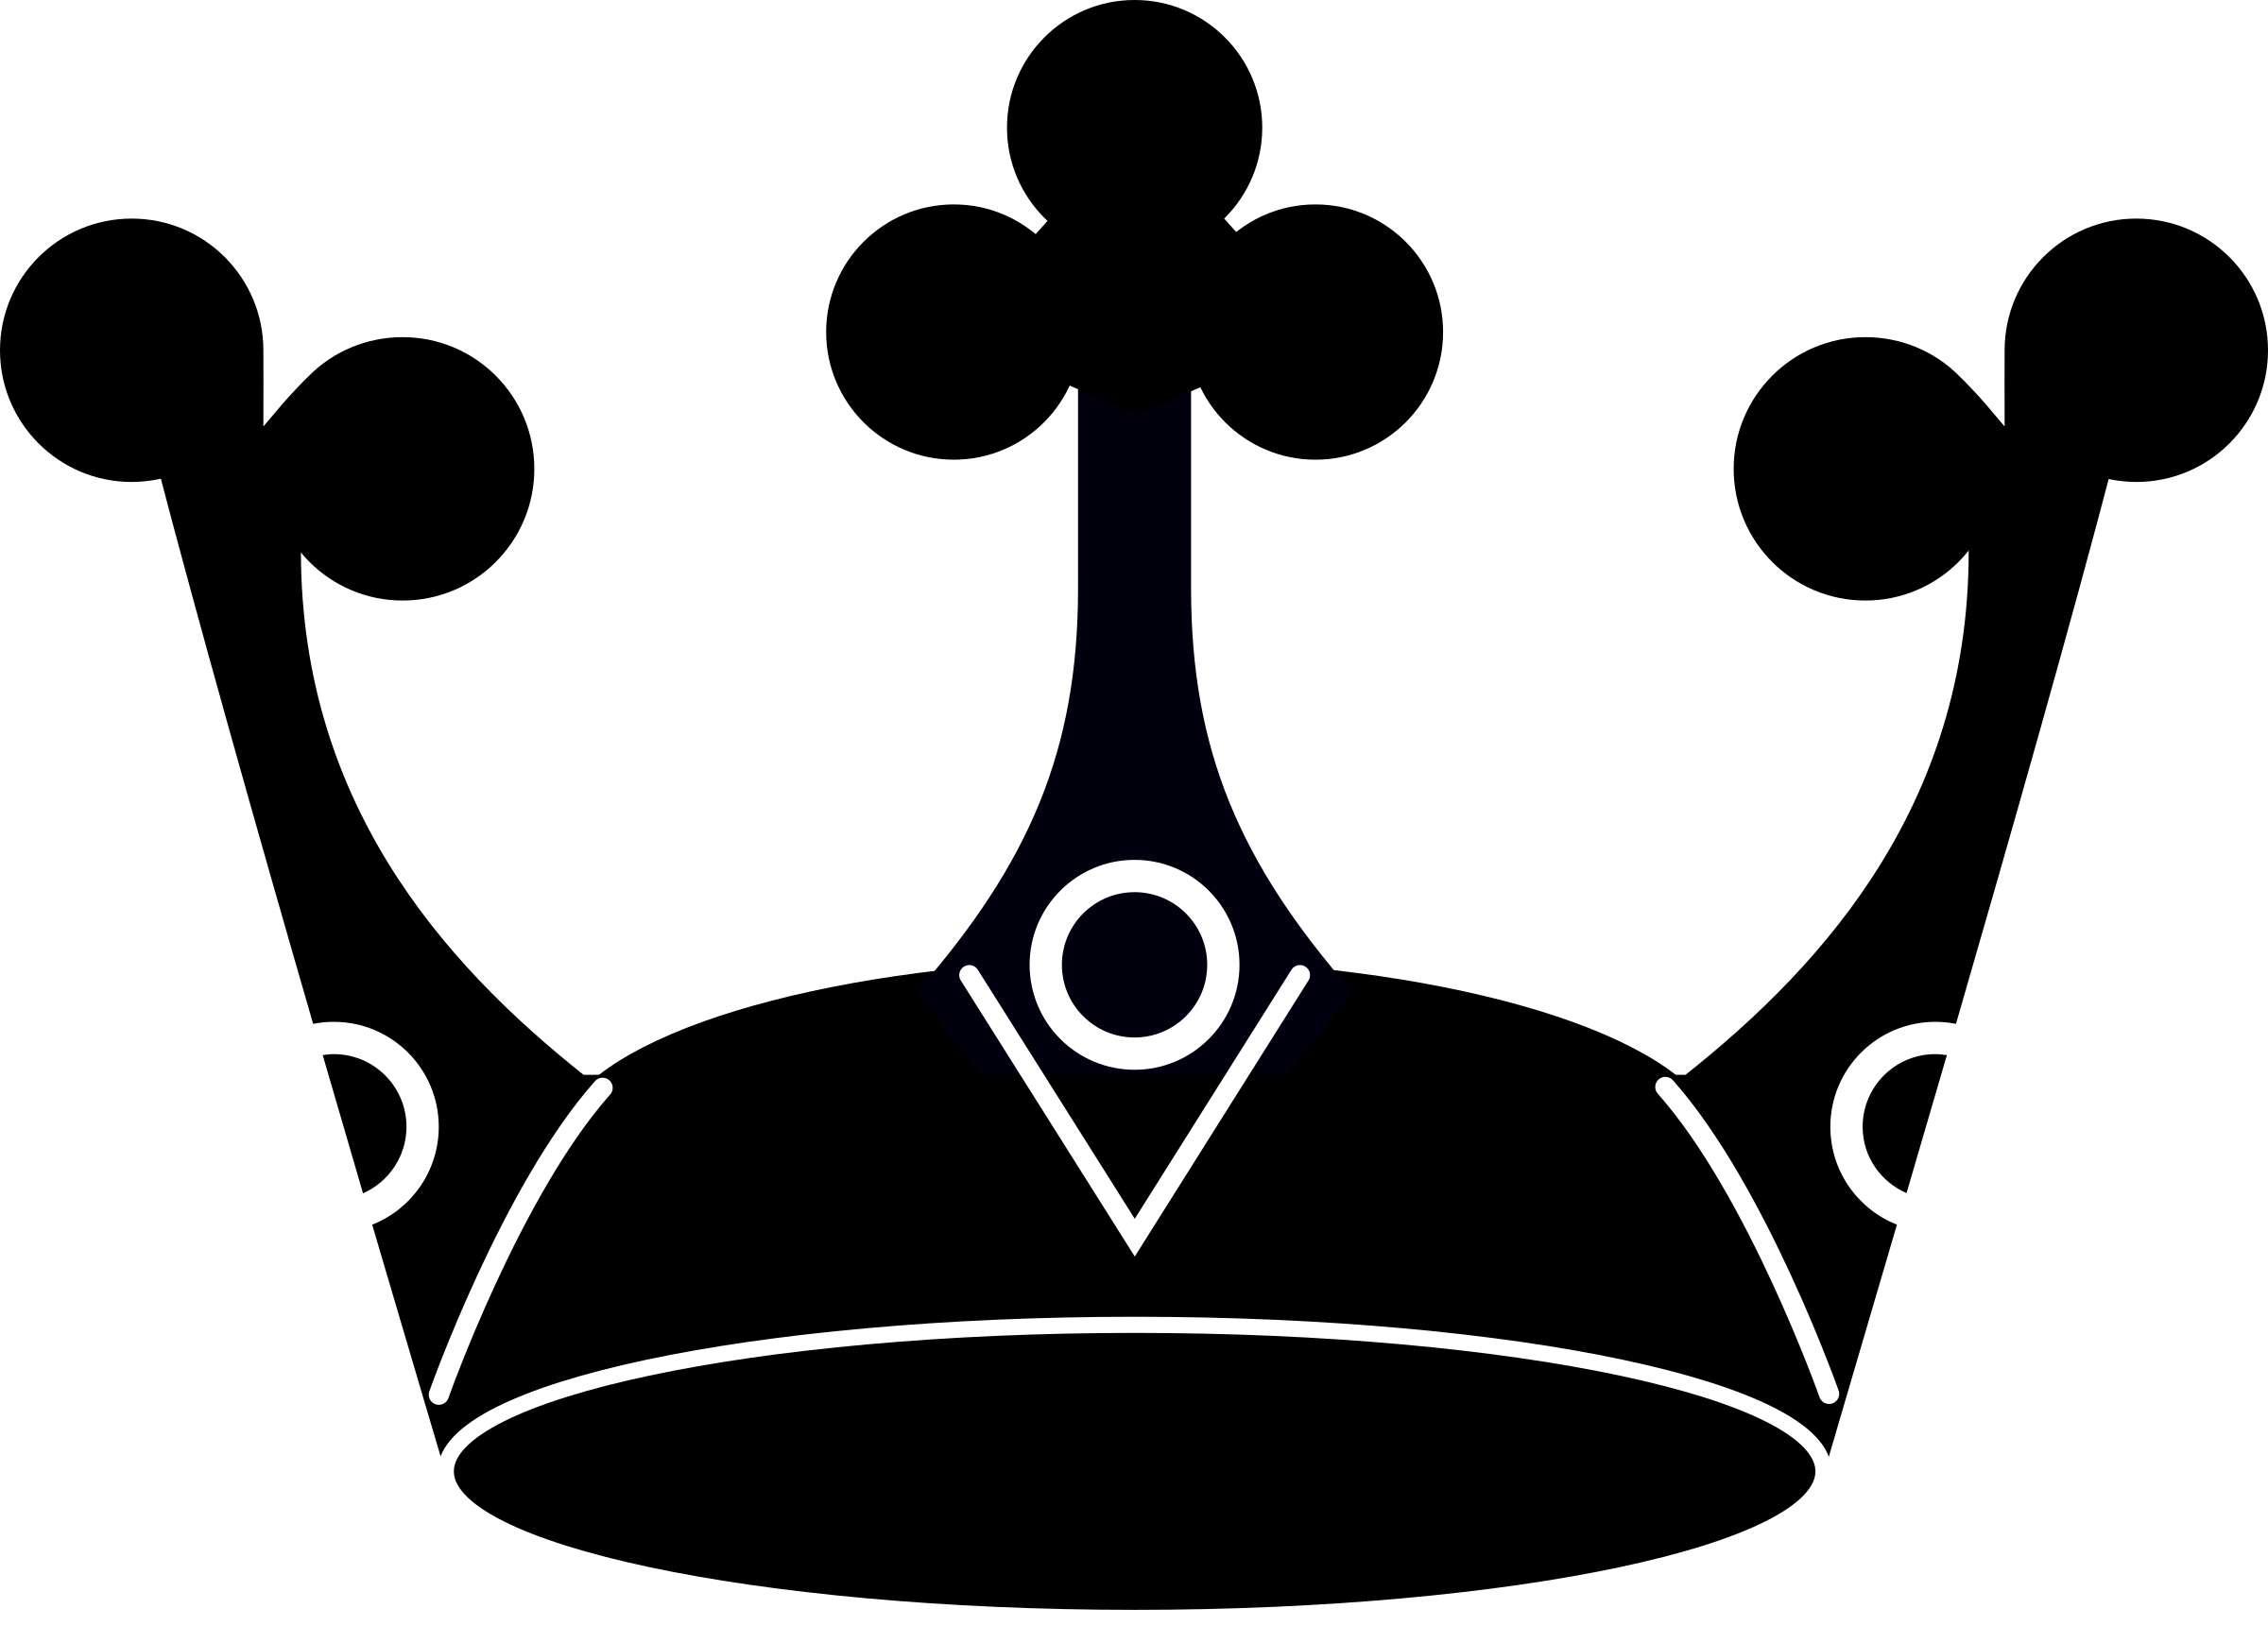 2400x1721 Download Royal Crown Silhouette